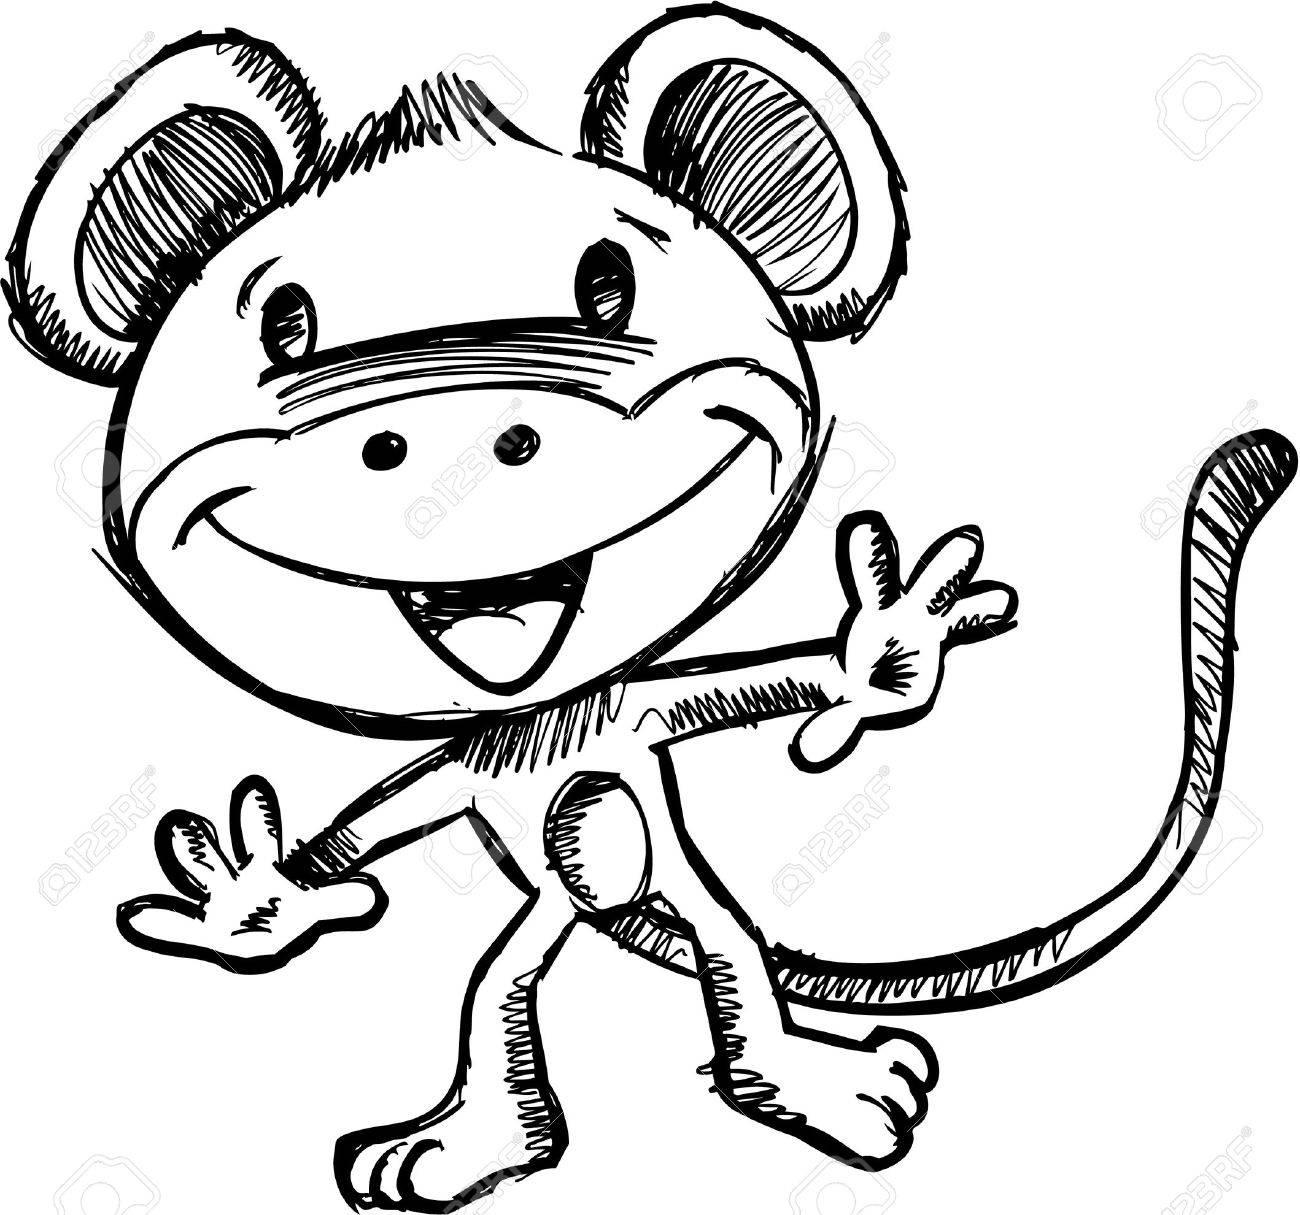 Doodle Sketchy Safari Monkey Stock Vector - 7167223